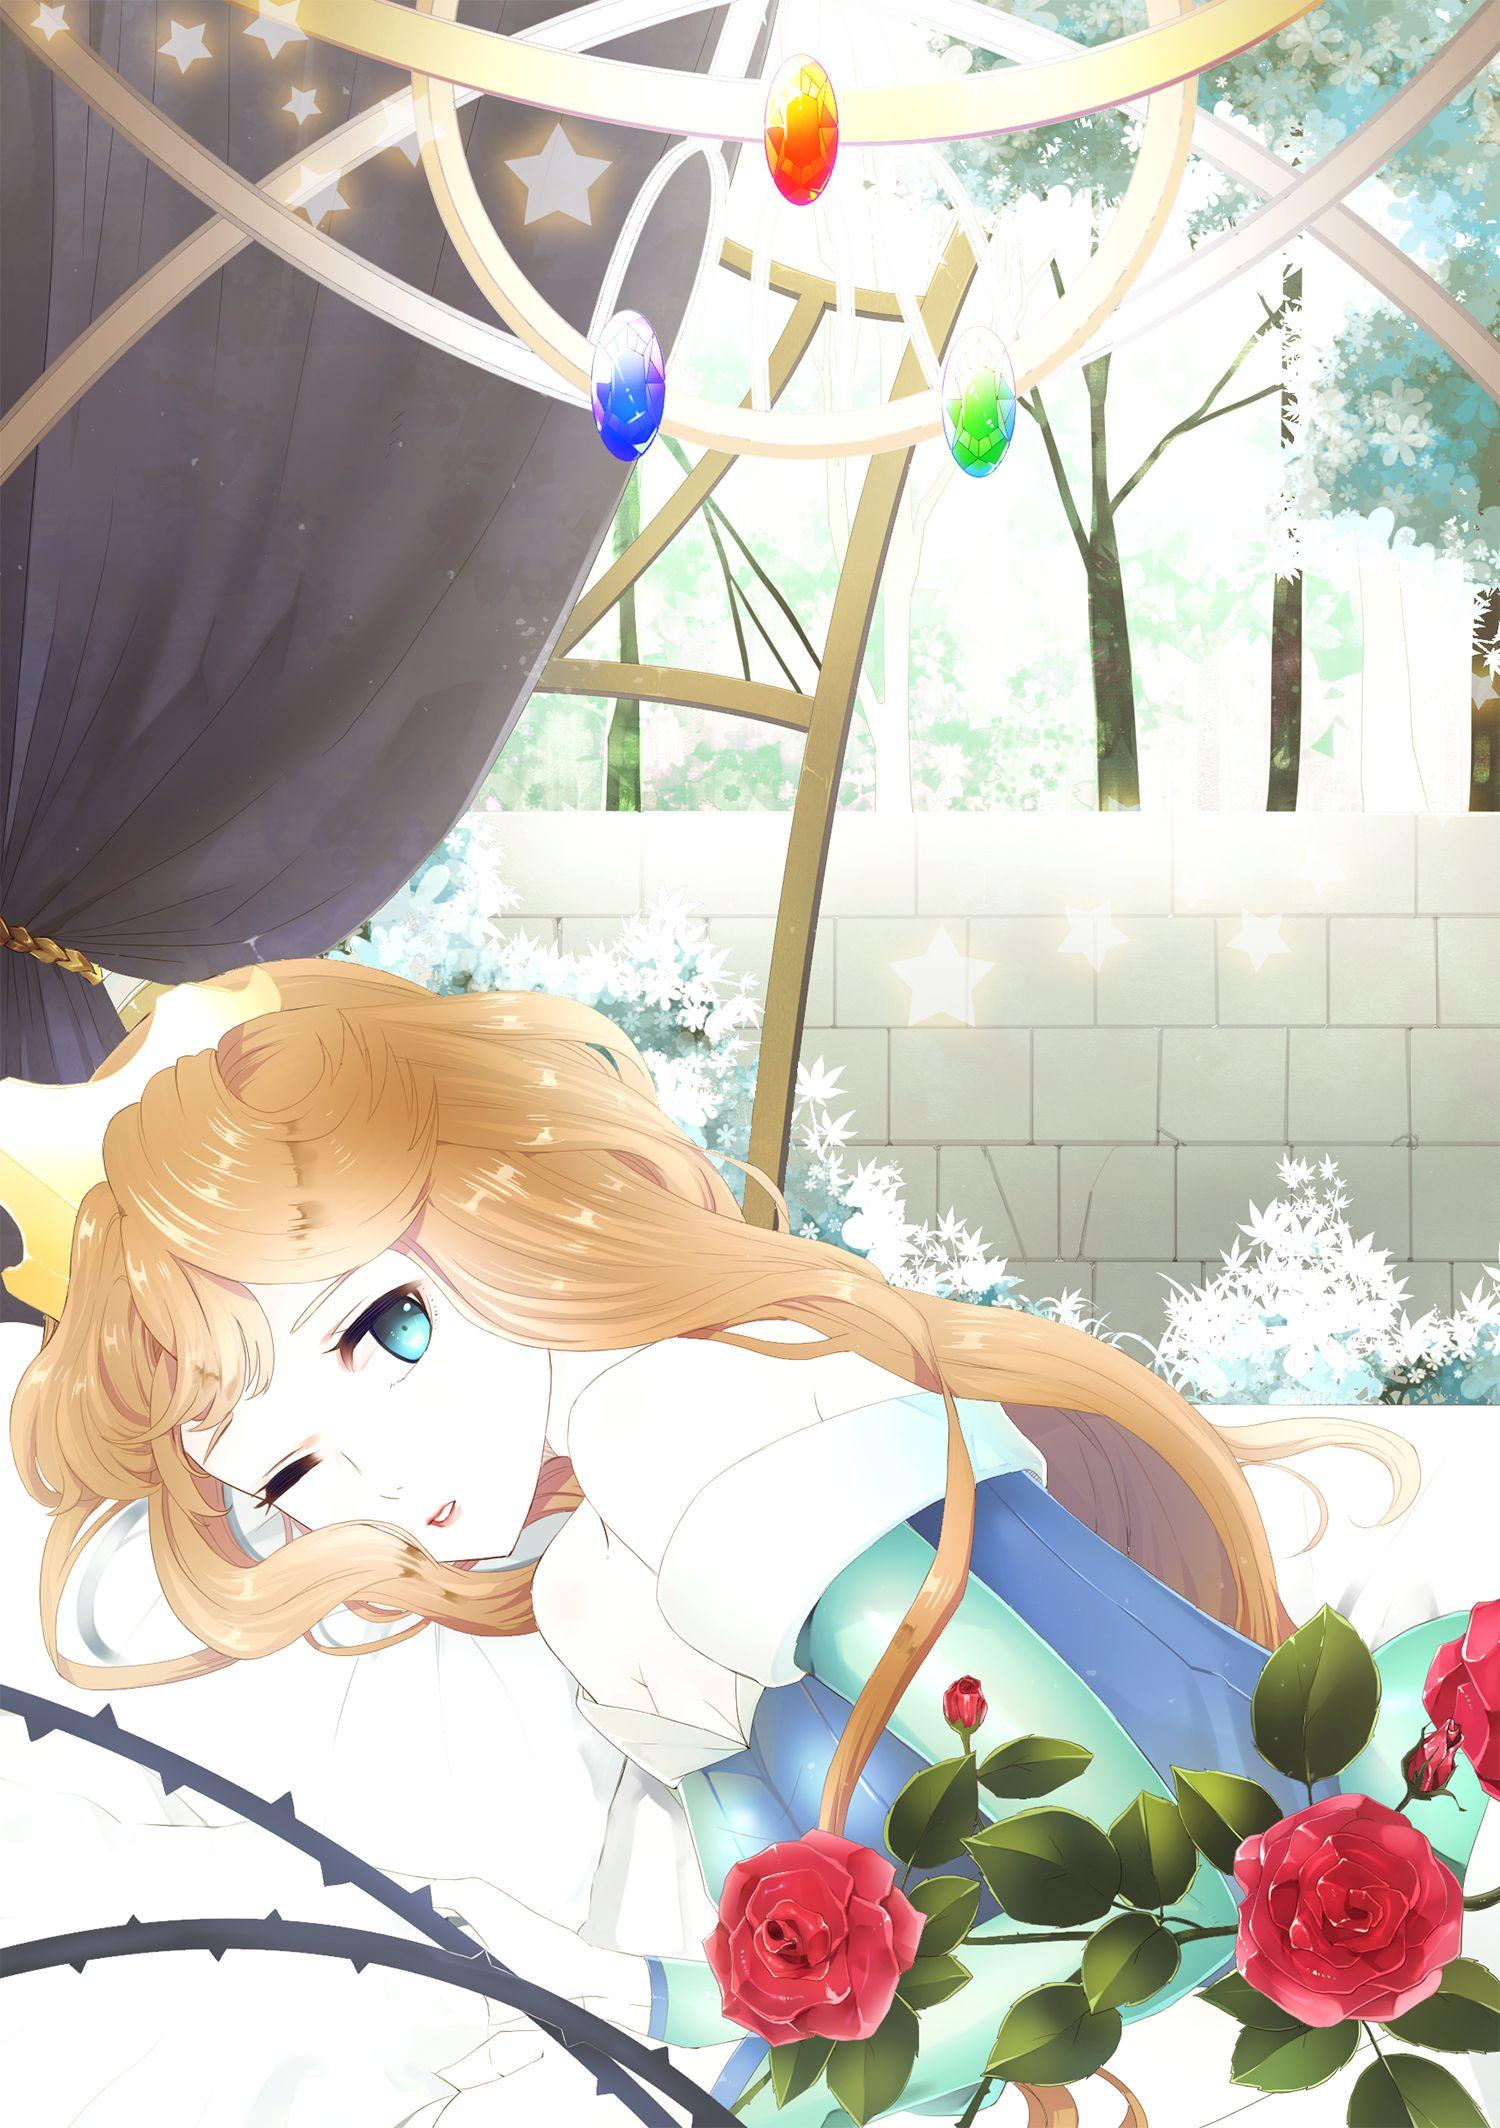 Like a sleeping rose disney anime princess princess aurora